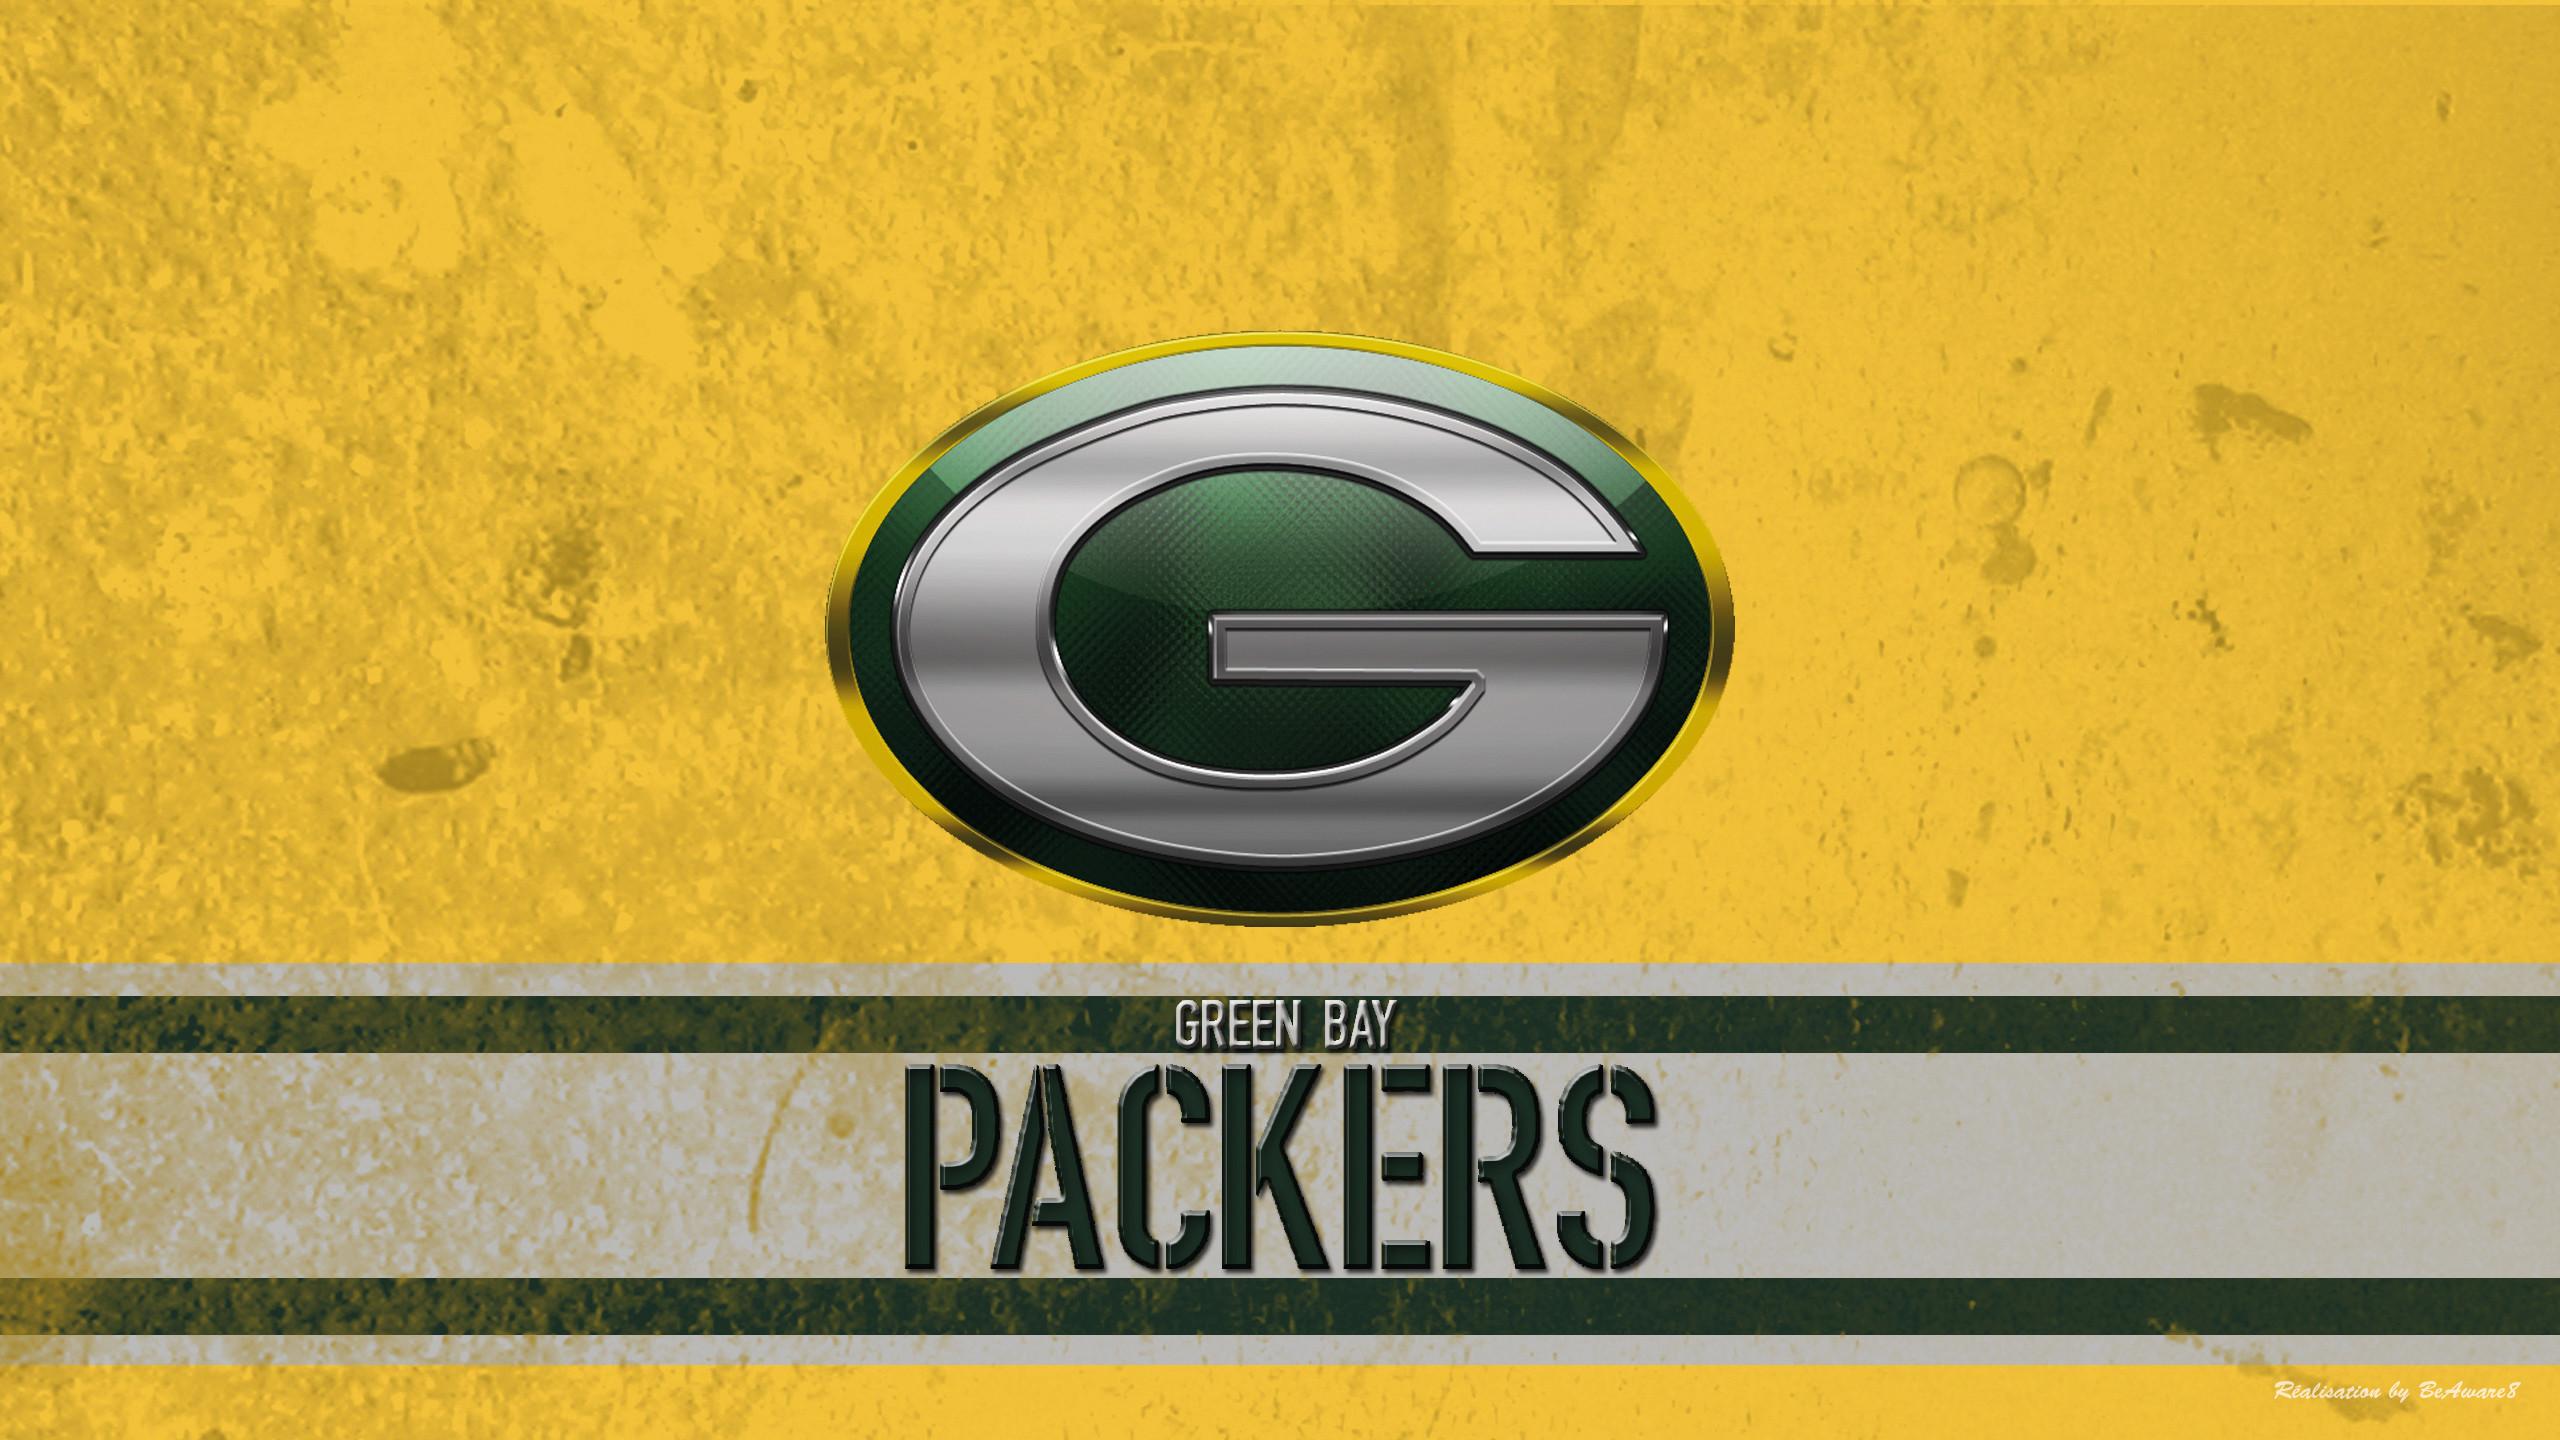 Green Bay Packers Wallpapers Wallpaper | HD Wallpapers | Pinterest | Green  bay packers wallpaper and Wallpaper